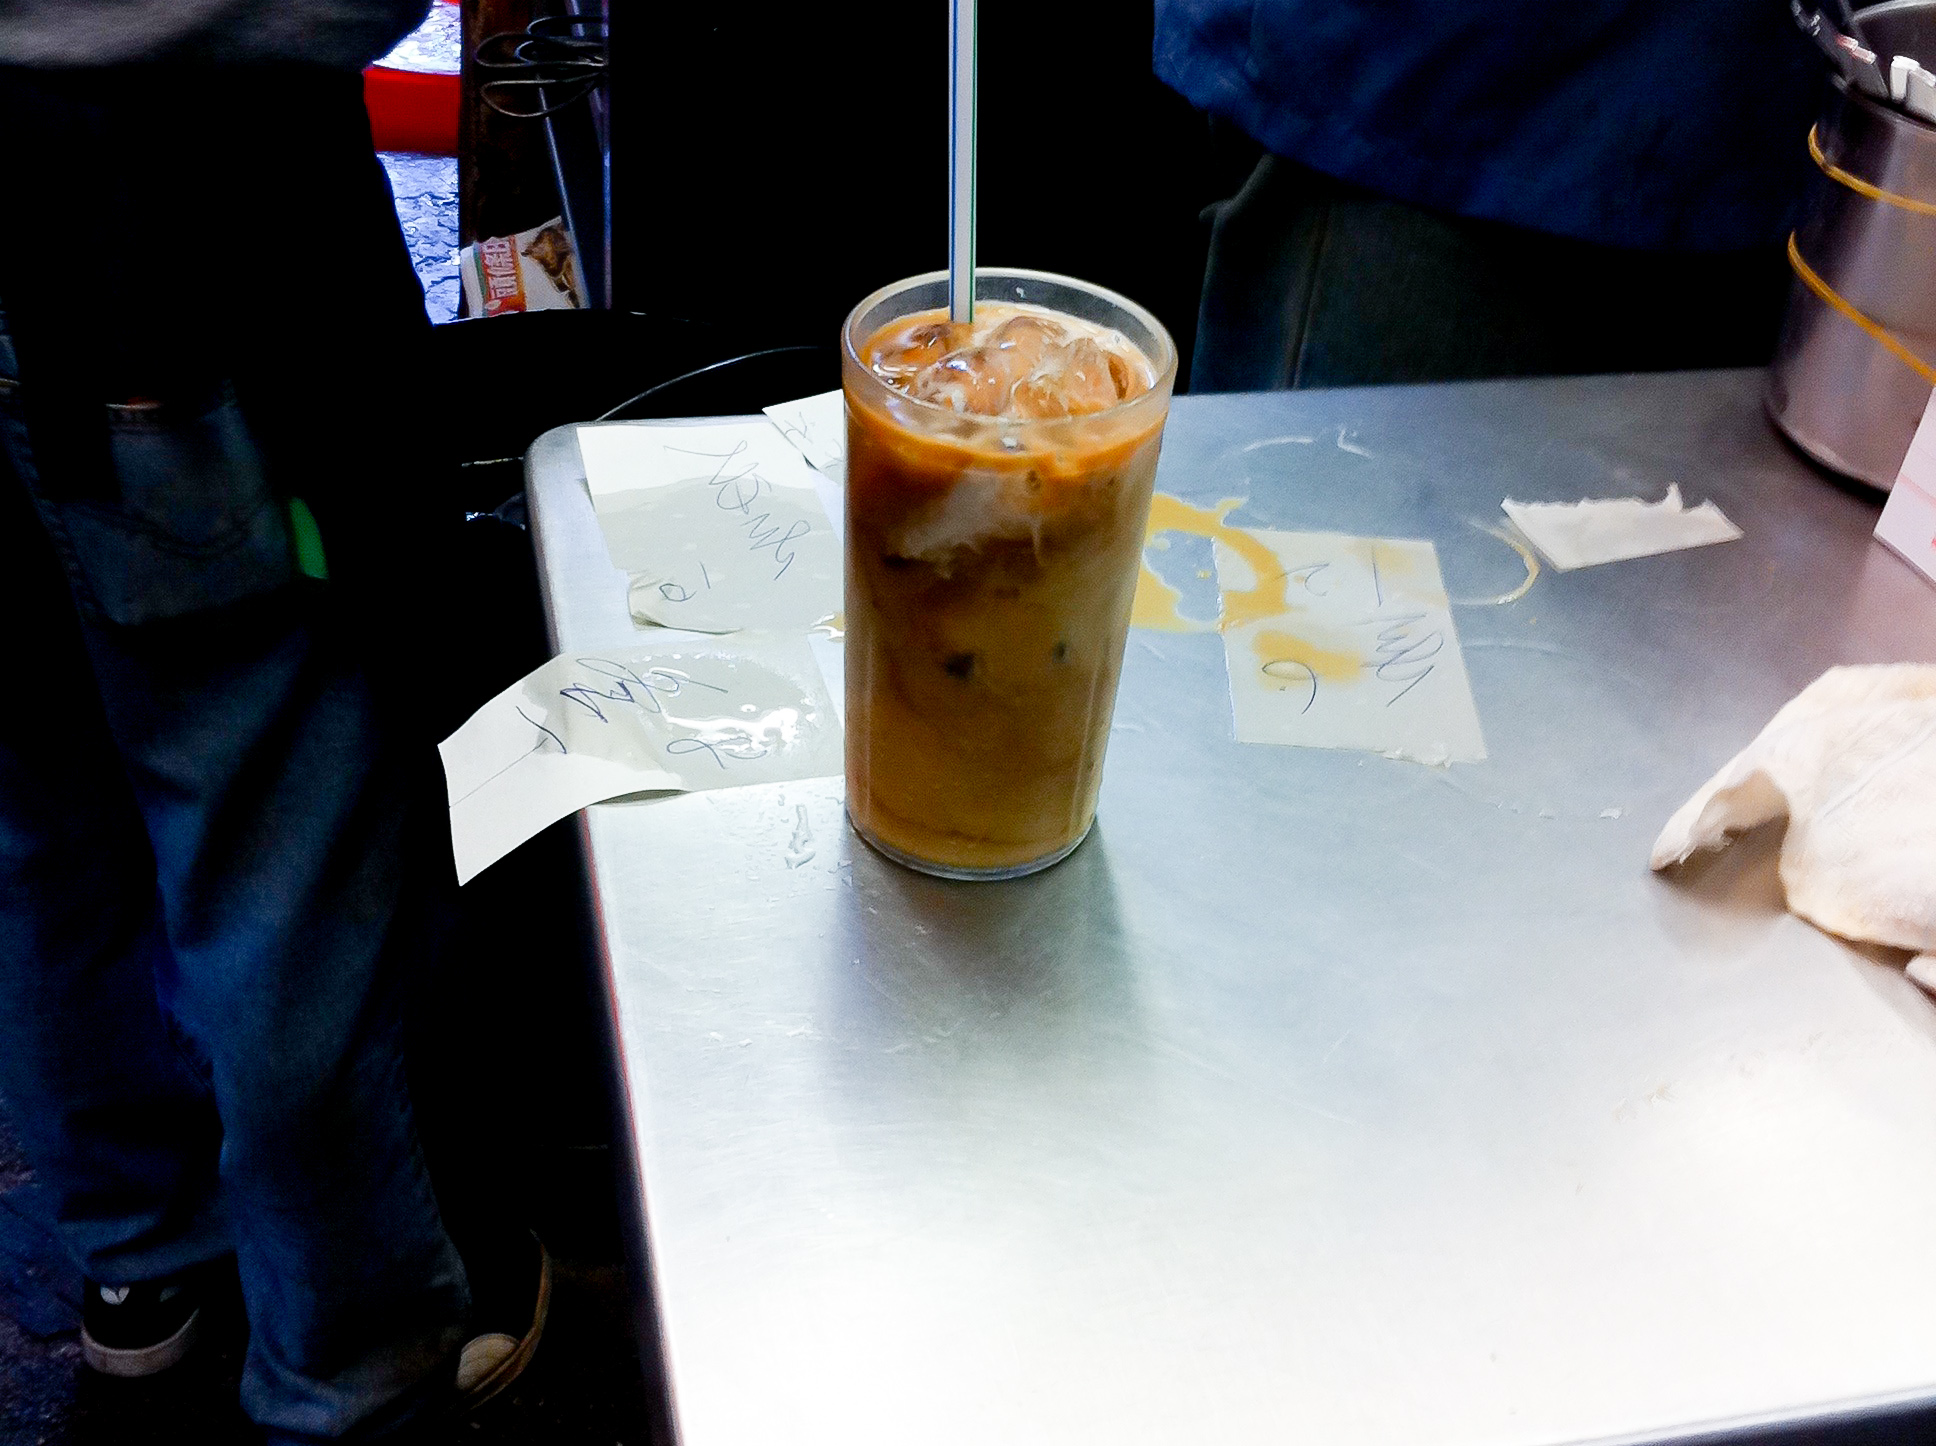 Hong Kong style milk tea at Lan Fong Yuen in Hong Kong. Photo by alphacityguides.